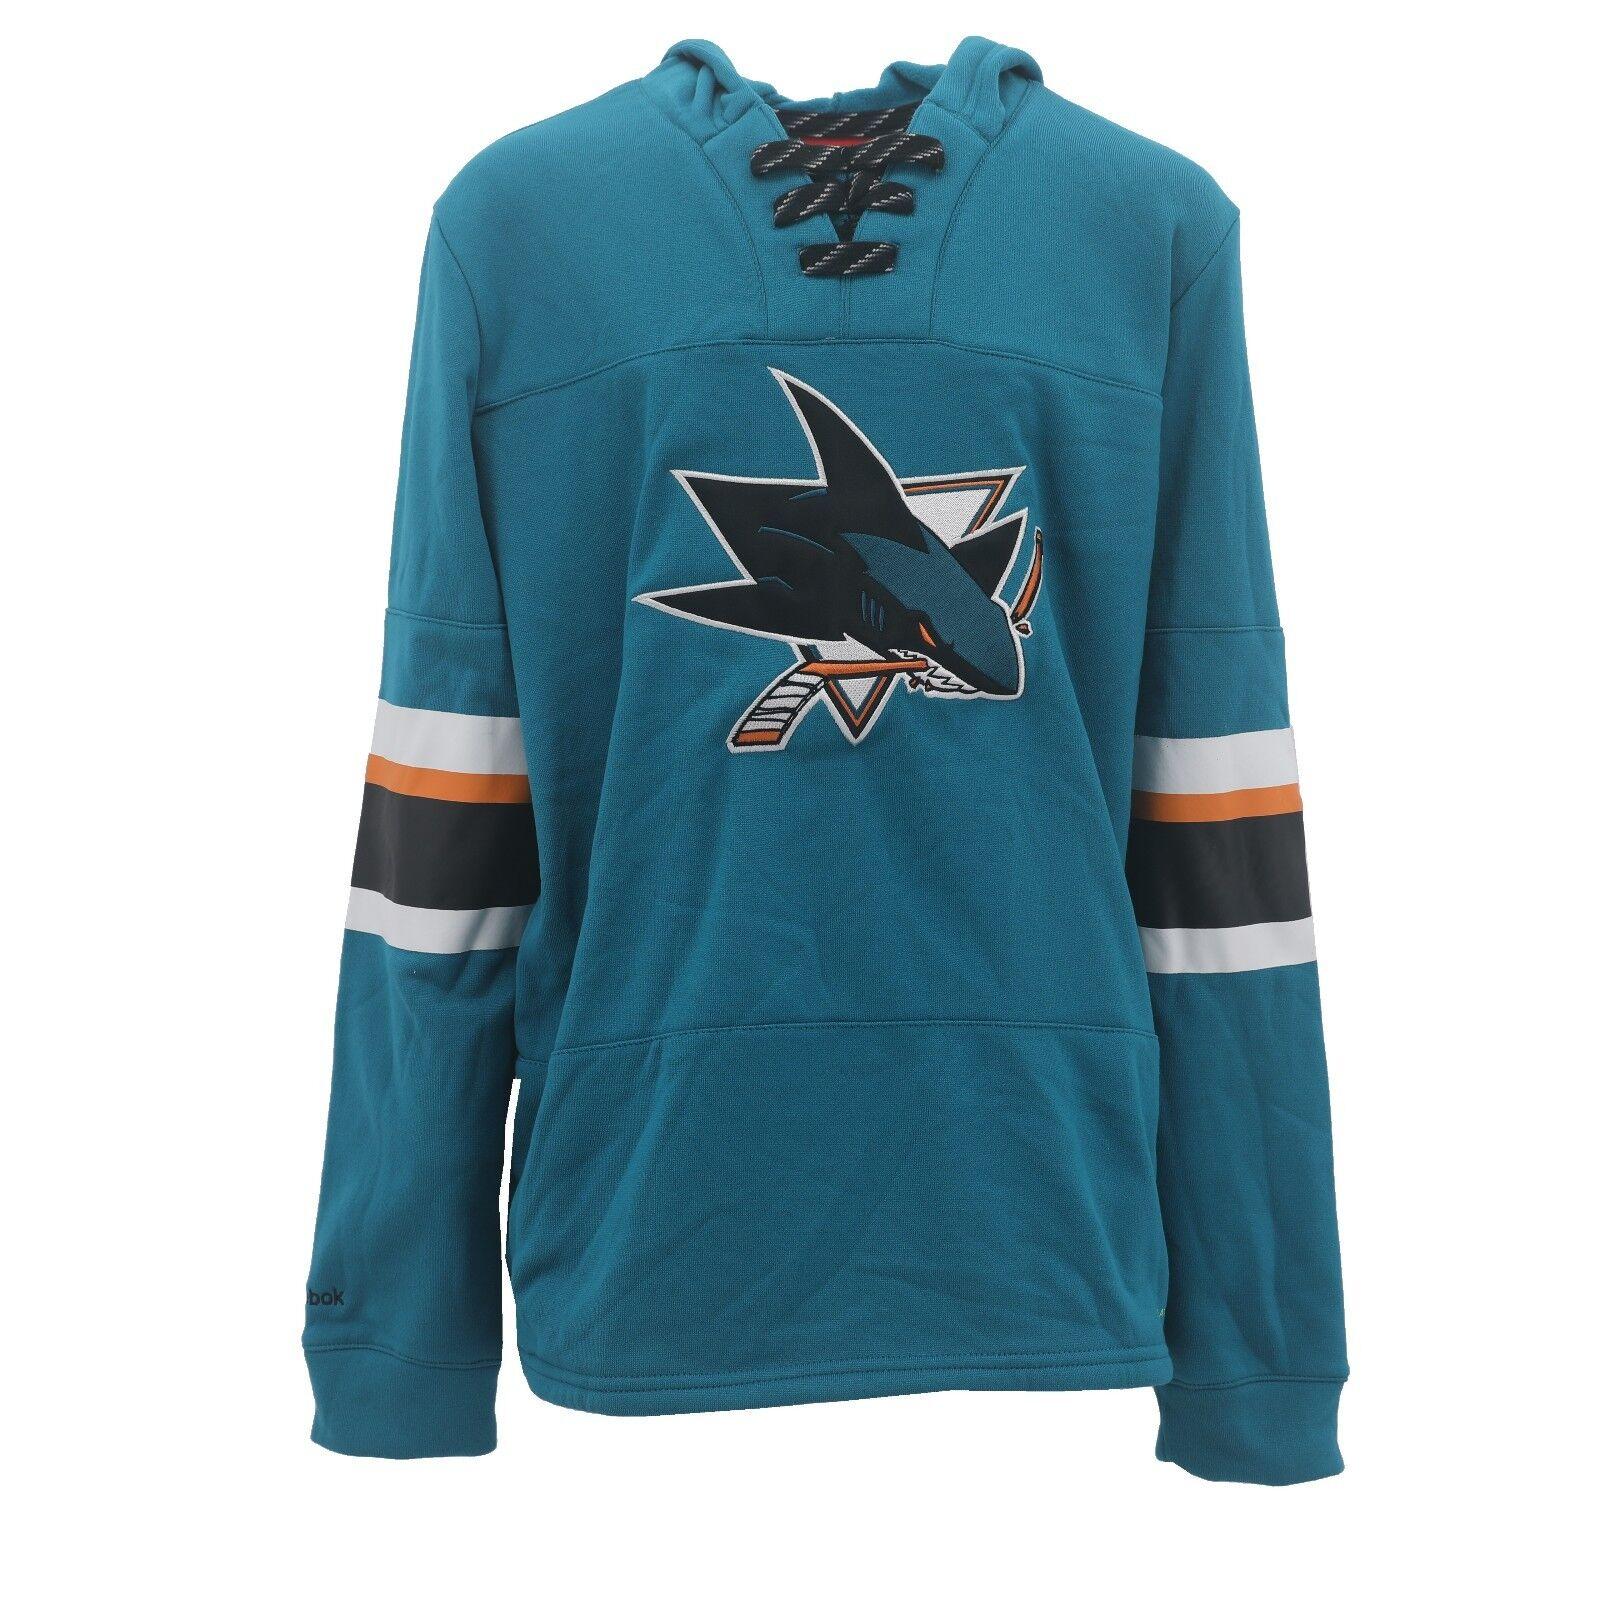 b40e13367 Reebok NHL San Jose Sharks Play Warm Youth Size Sweatshirt Official New W  Tags